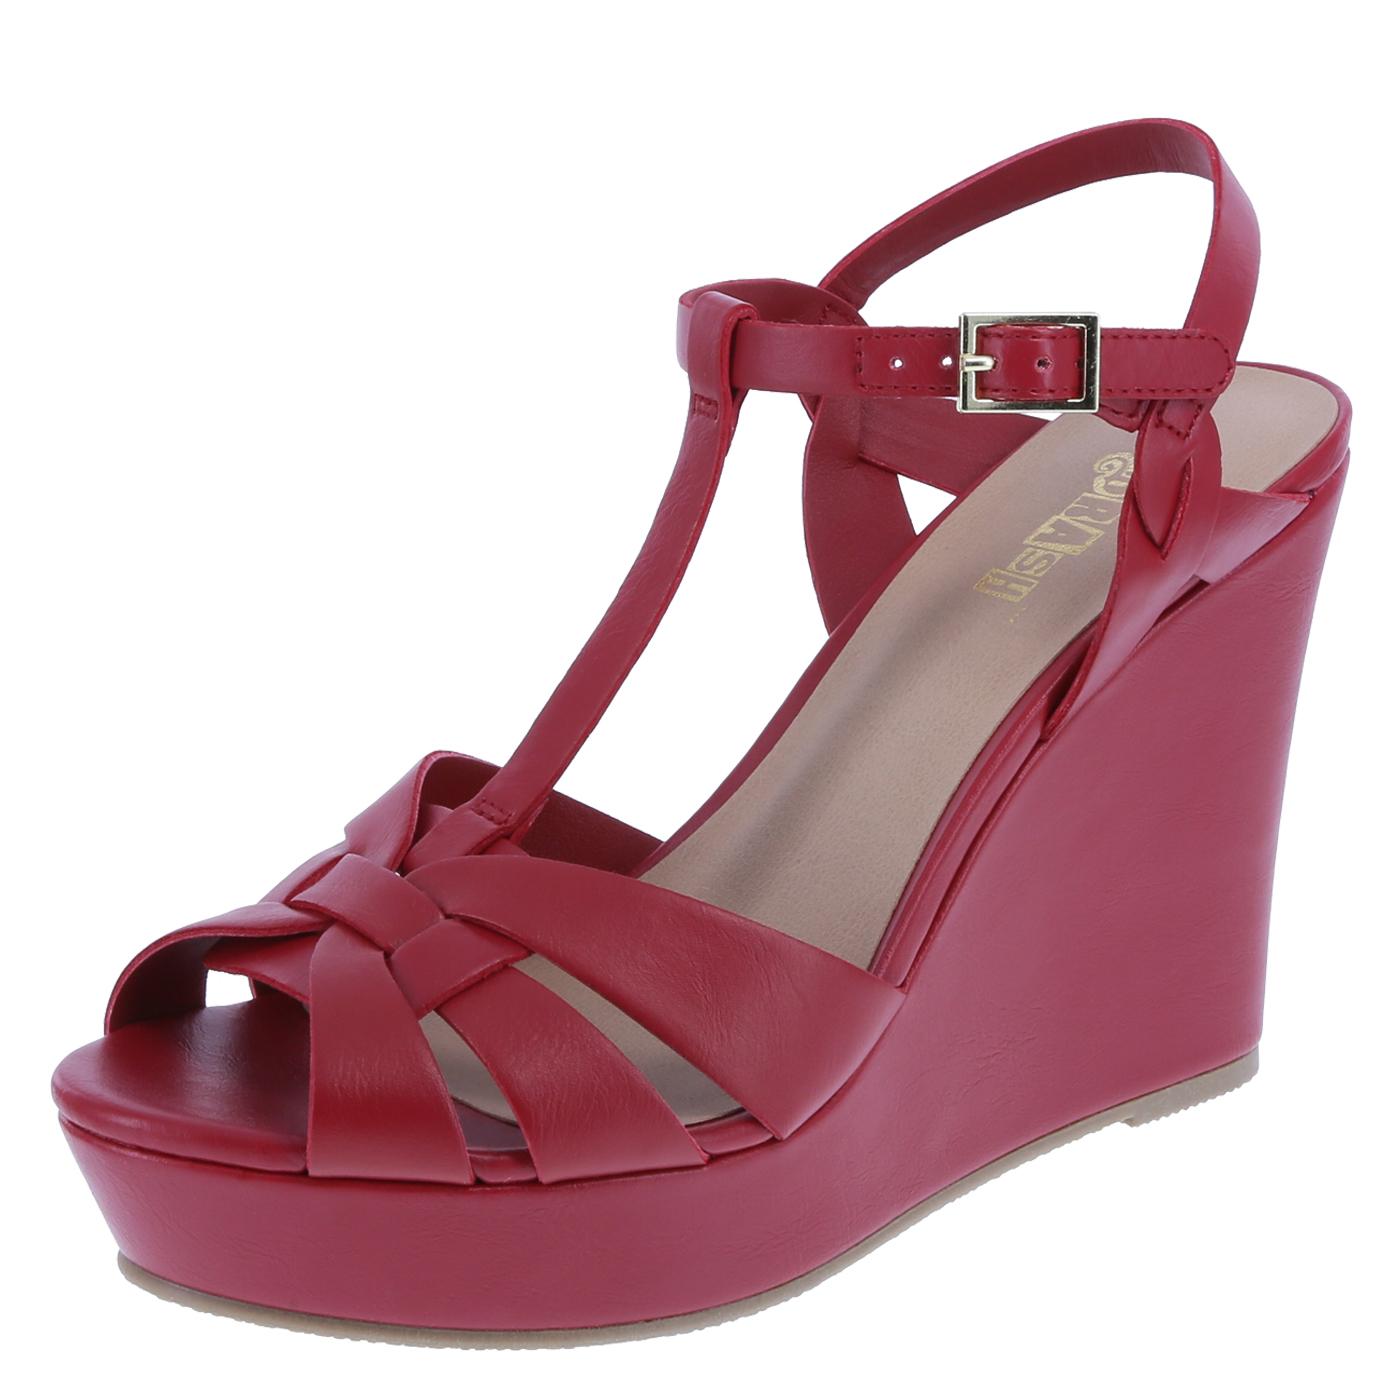 wedges shoes womenu0027s kandid t-strap high wedge sandal, red, hi-res ijqkale